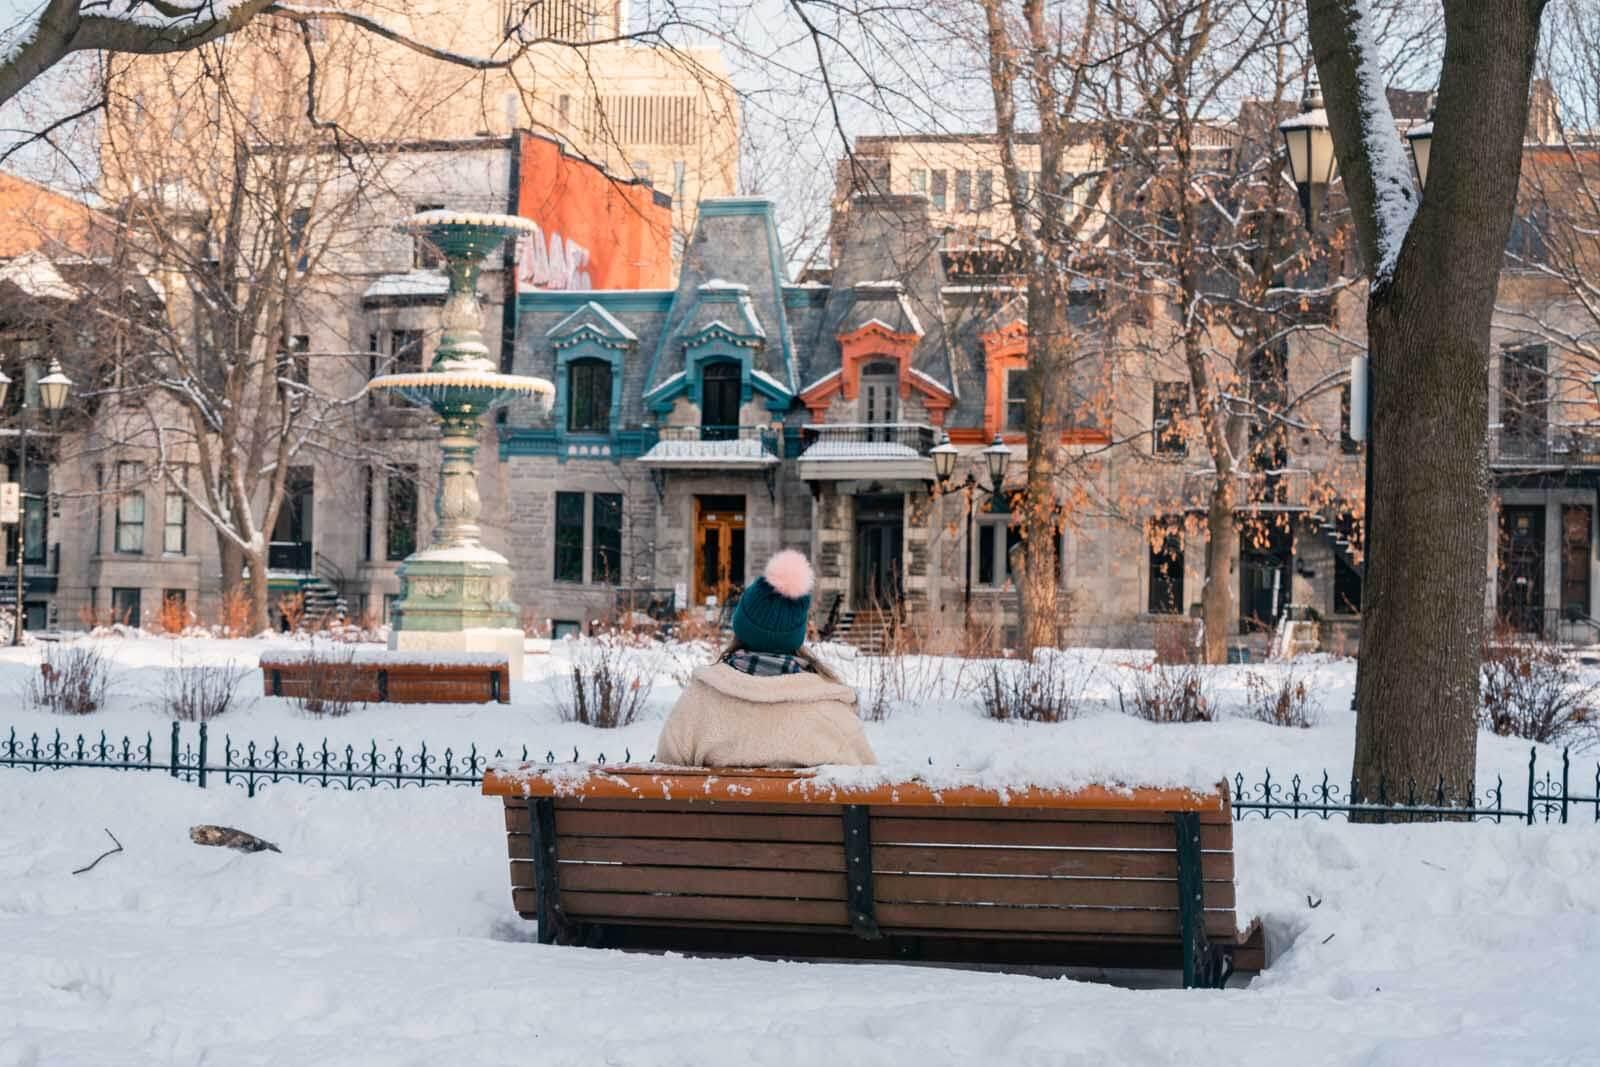 Megan looking at Saint Louis Square in Montreal